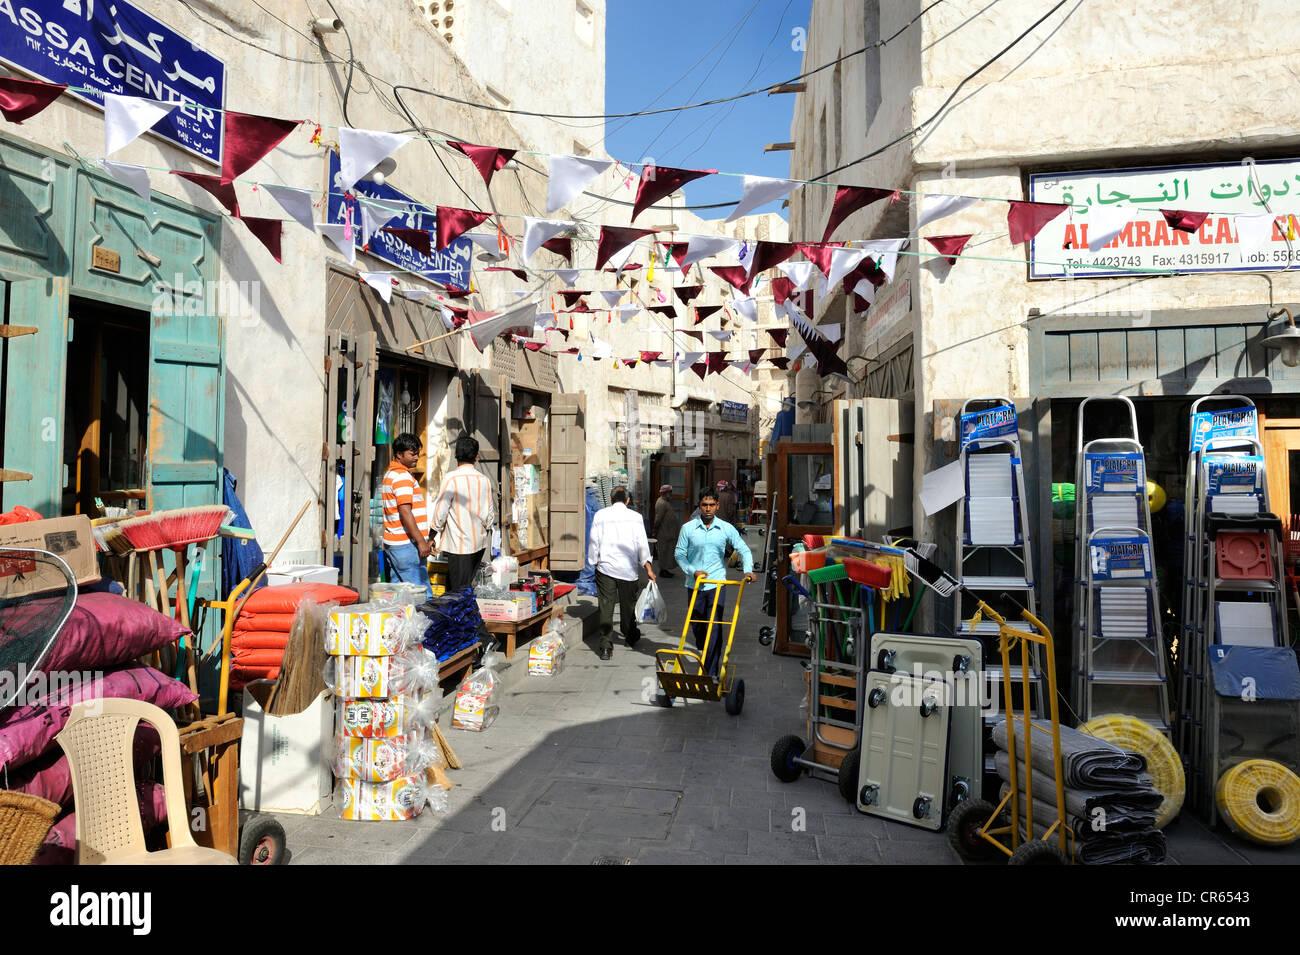 Merchants in Souq al Waqif, the oldest souq or bazaar in the country, , Qatar, Arabian Peninsula, Persian Gulf, - Stock Image